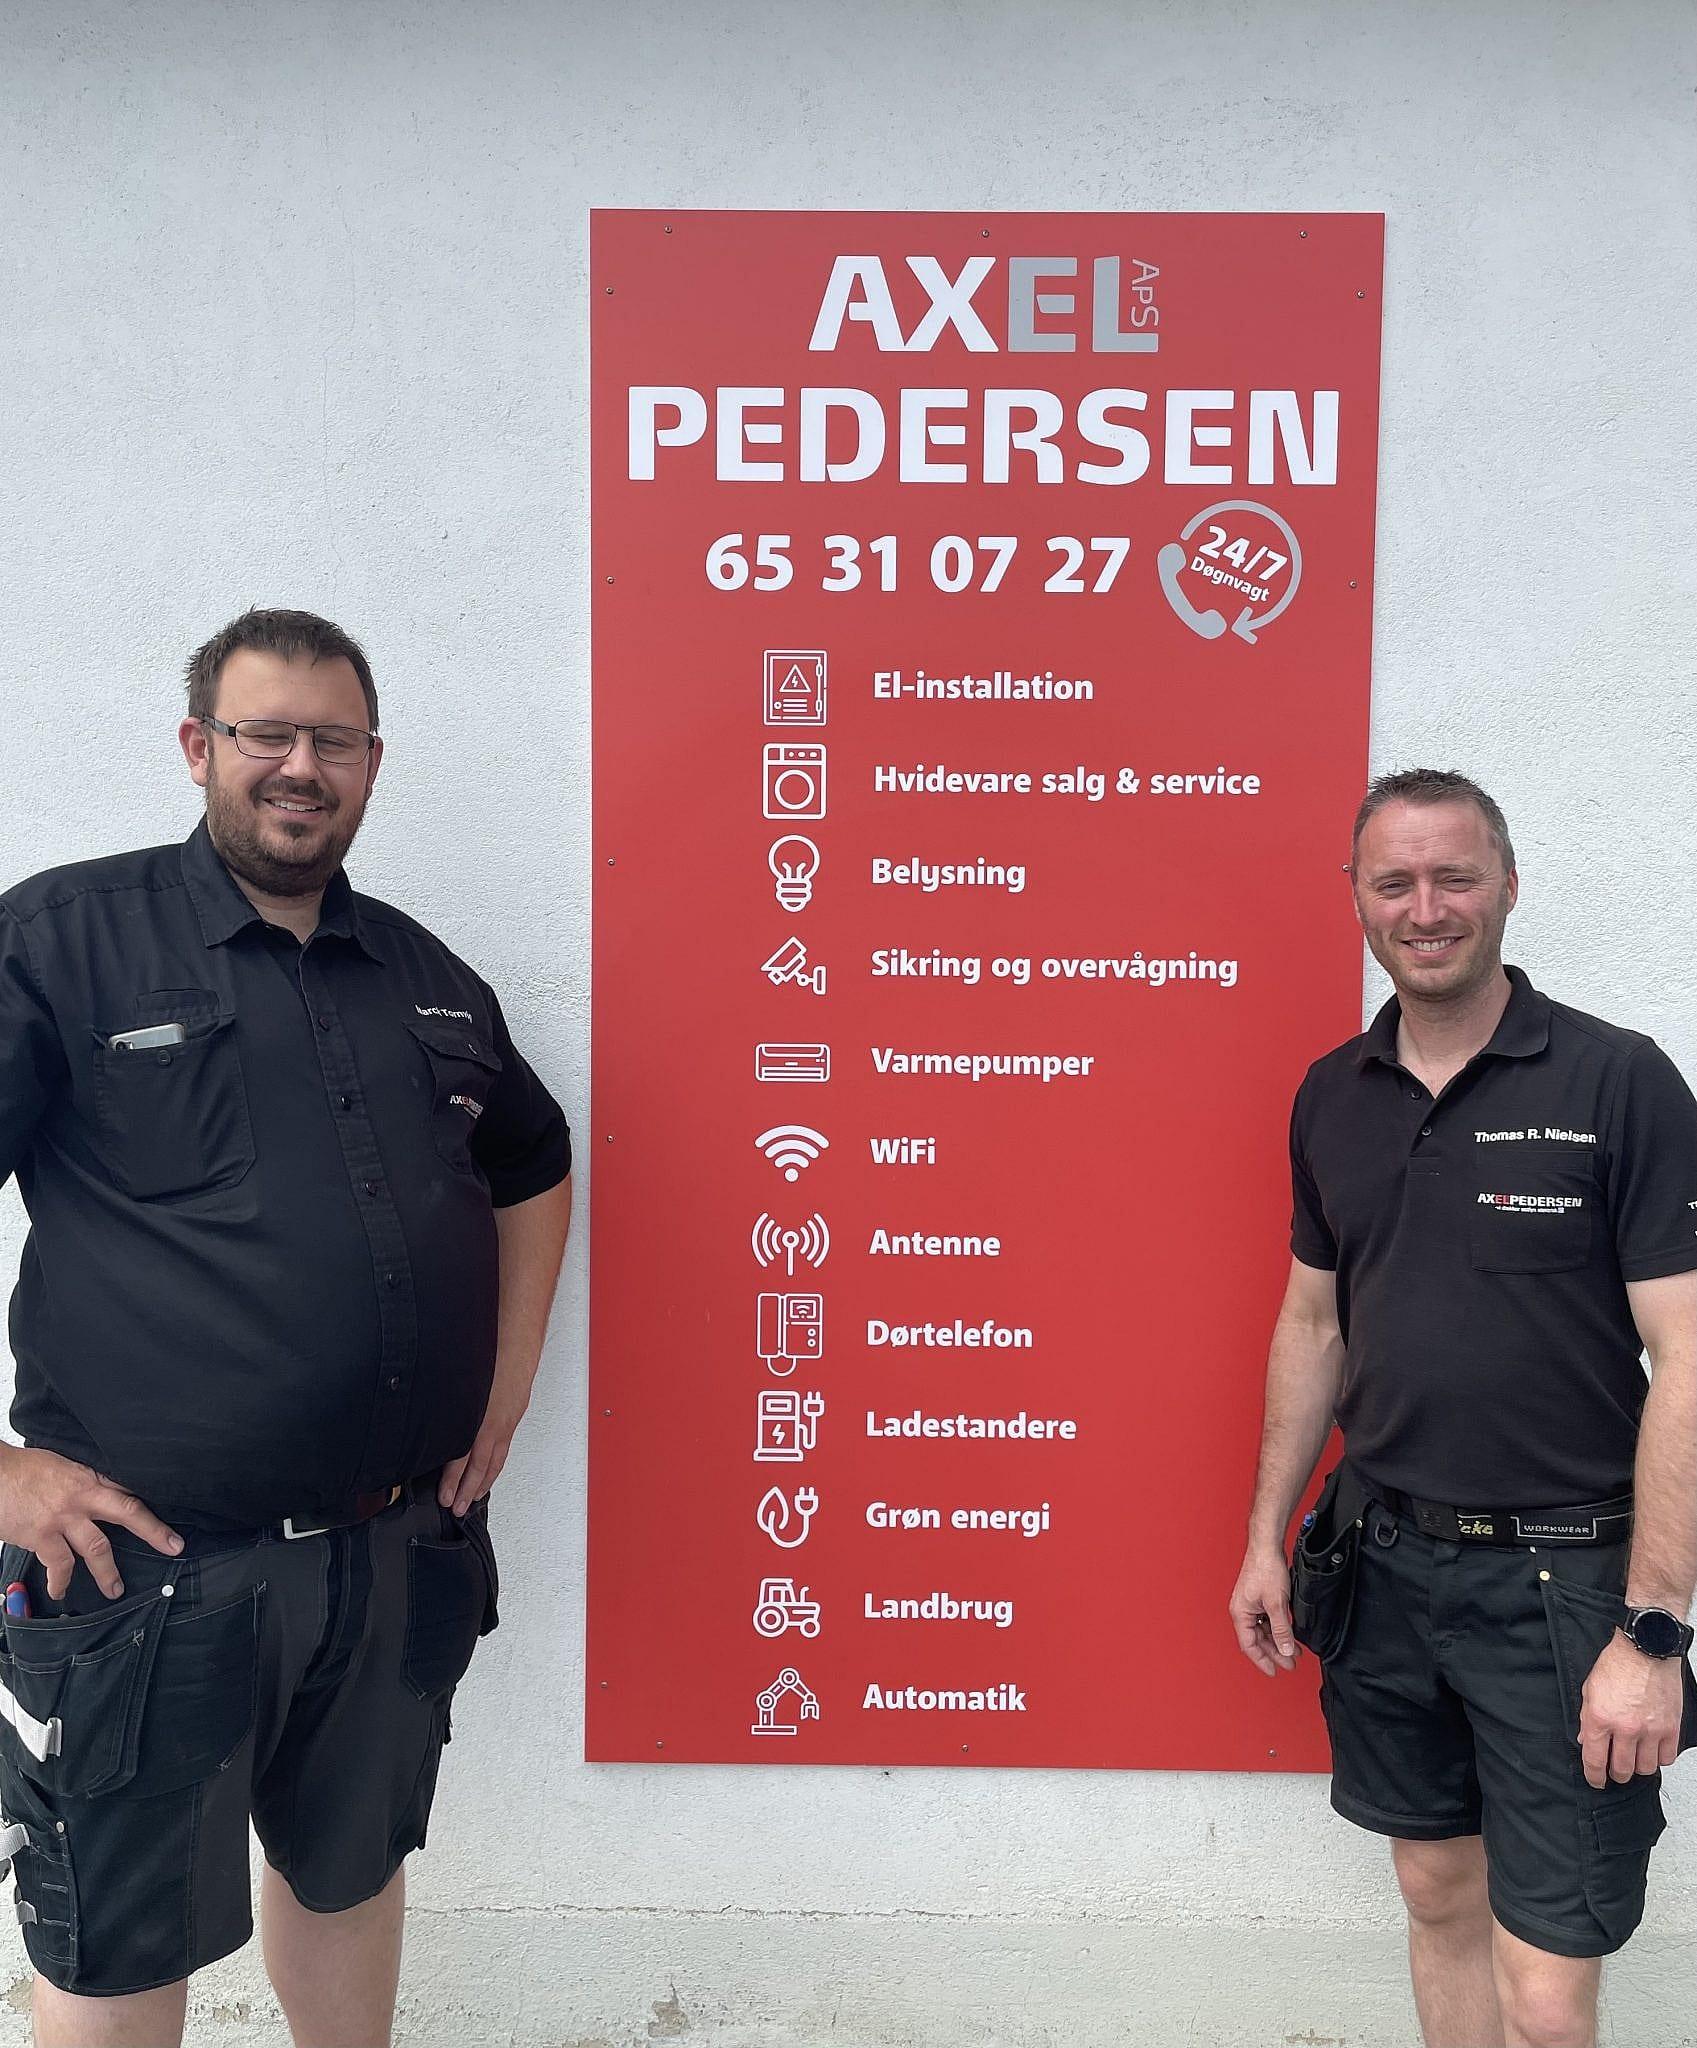 Axel Pedersen ApS i Nyborg